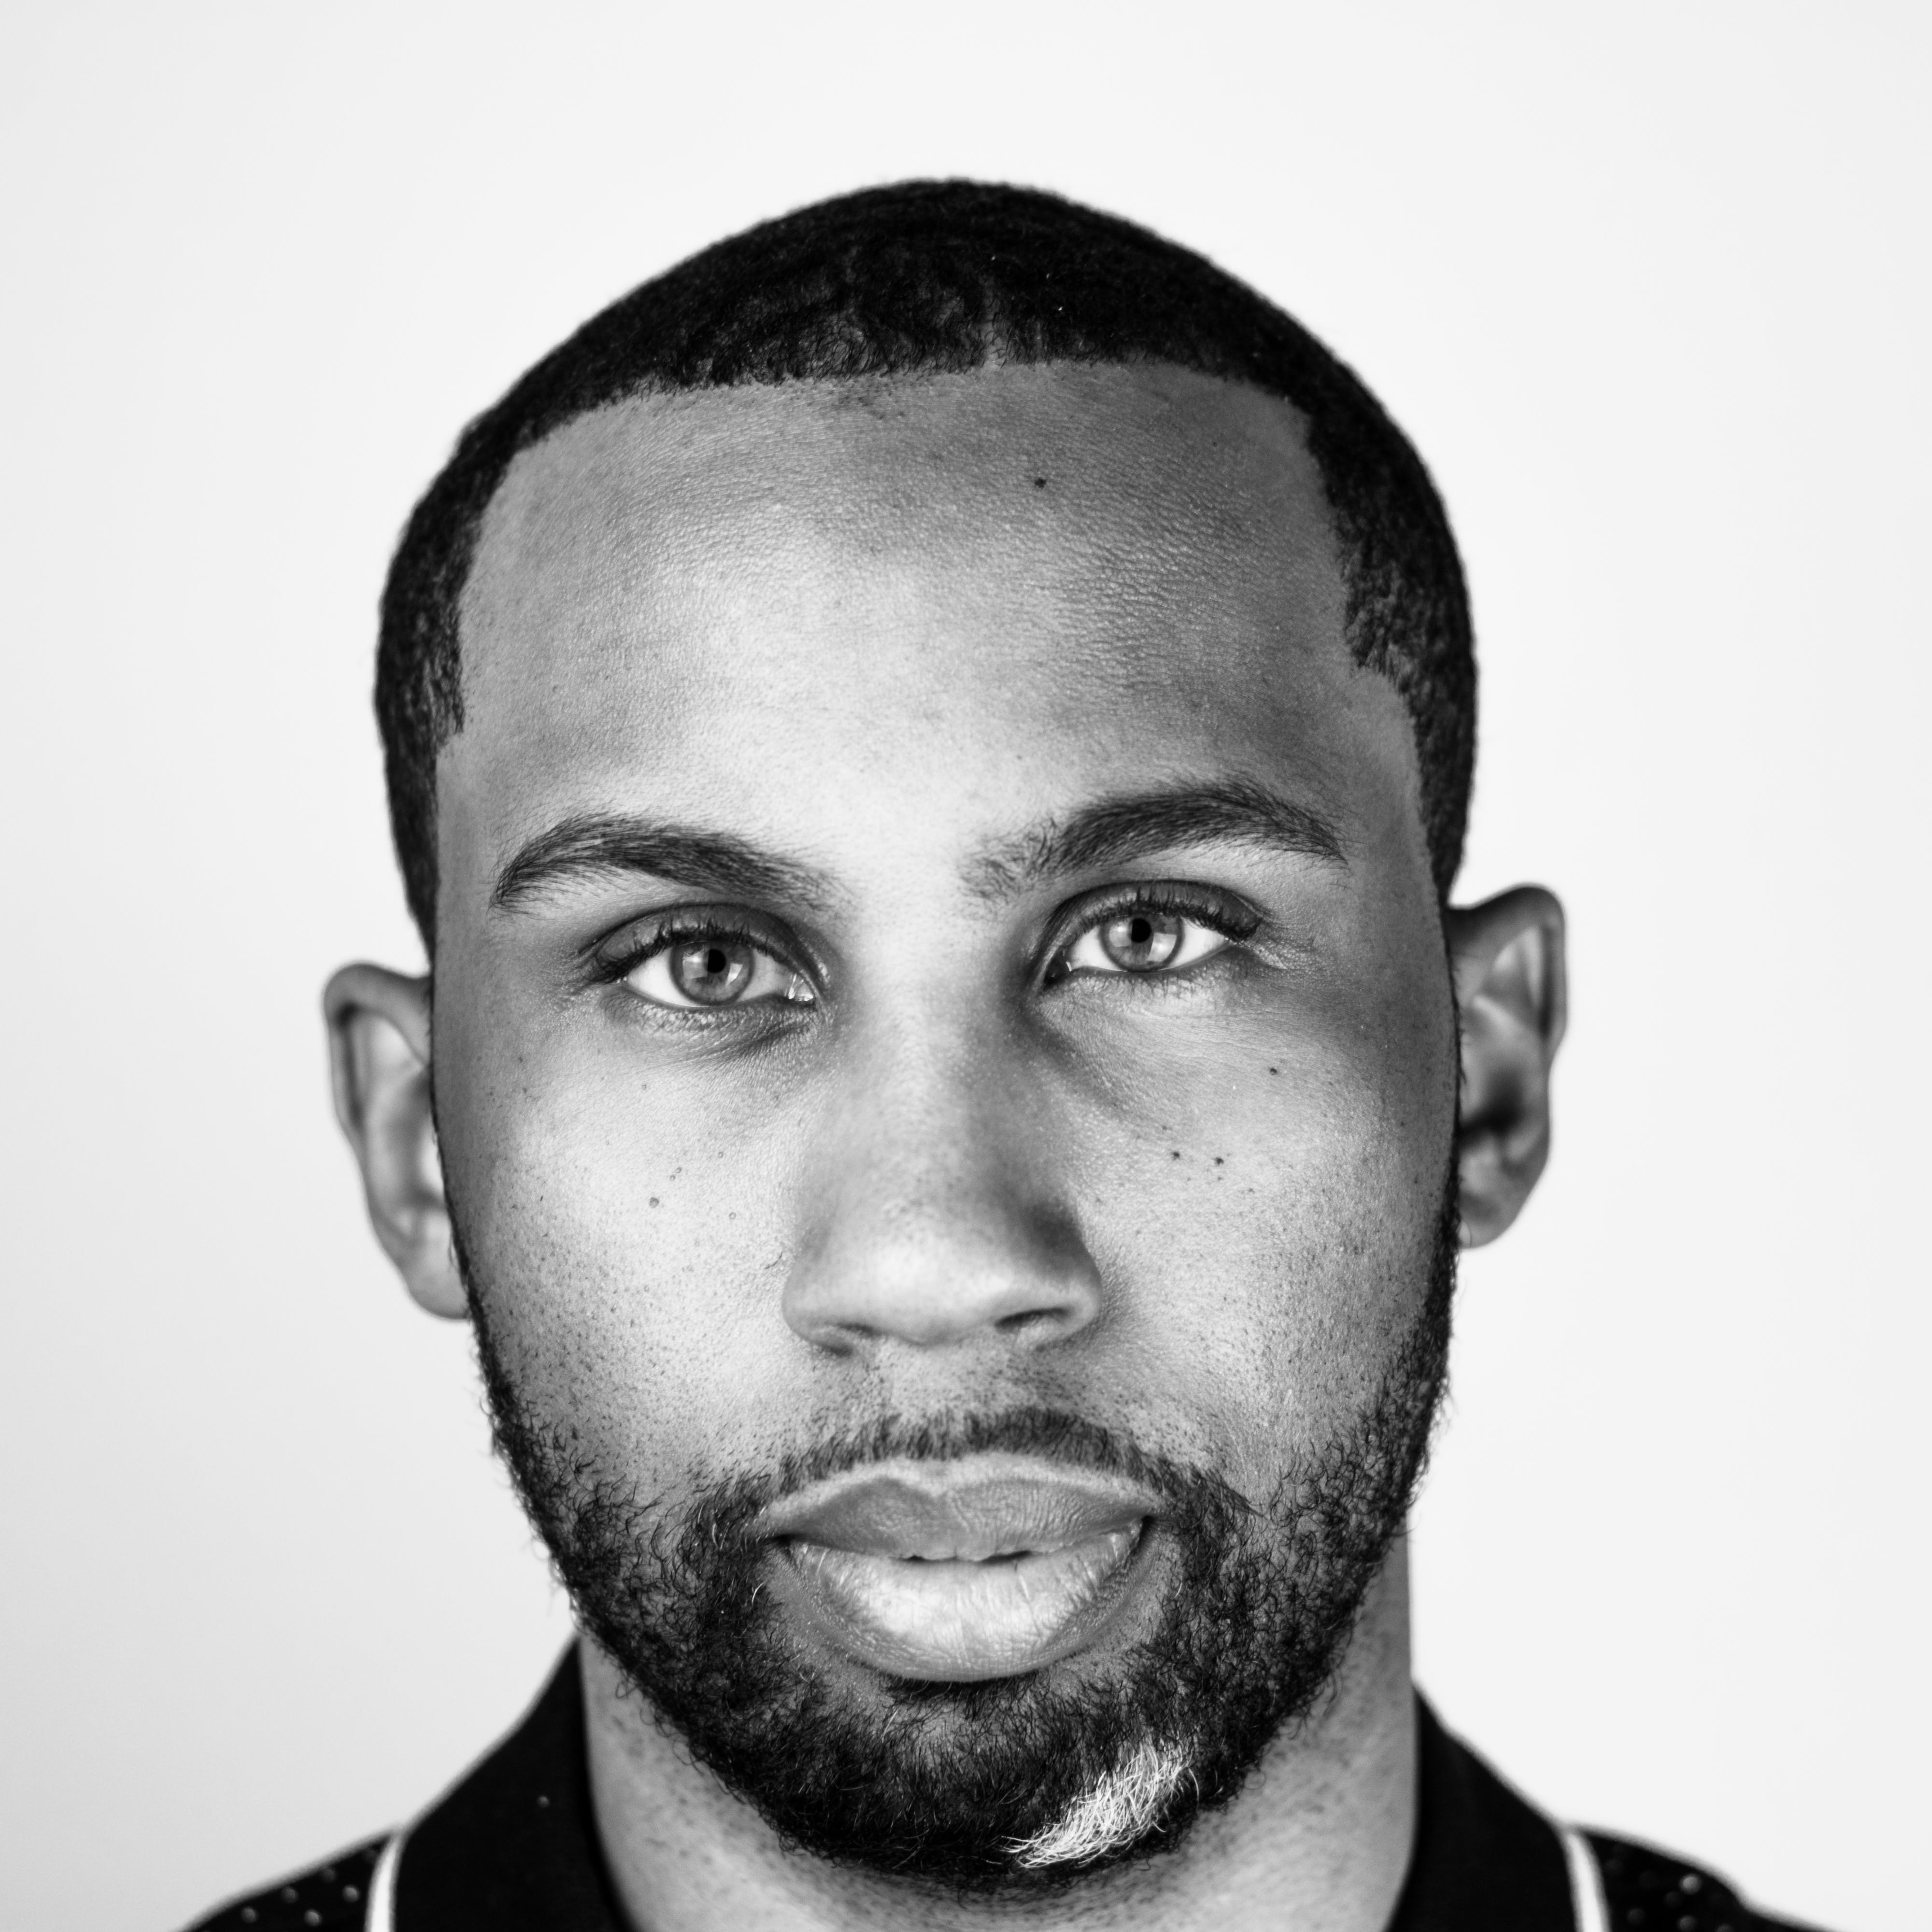 Monochrome Photo of Man With Beard